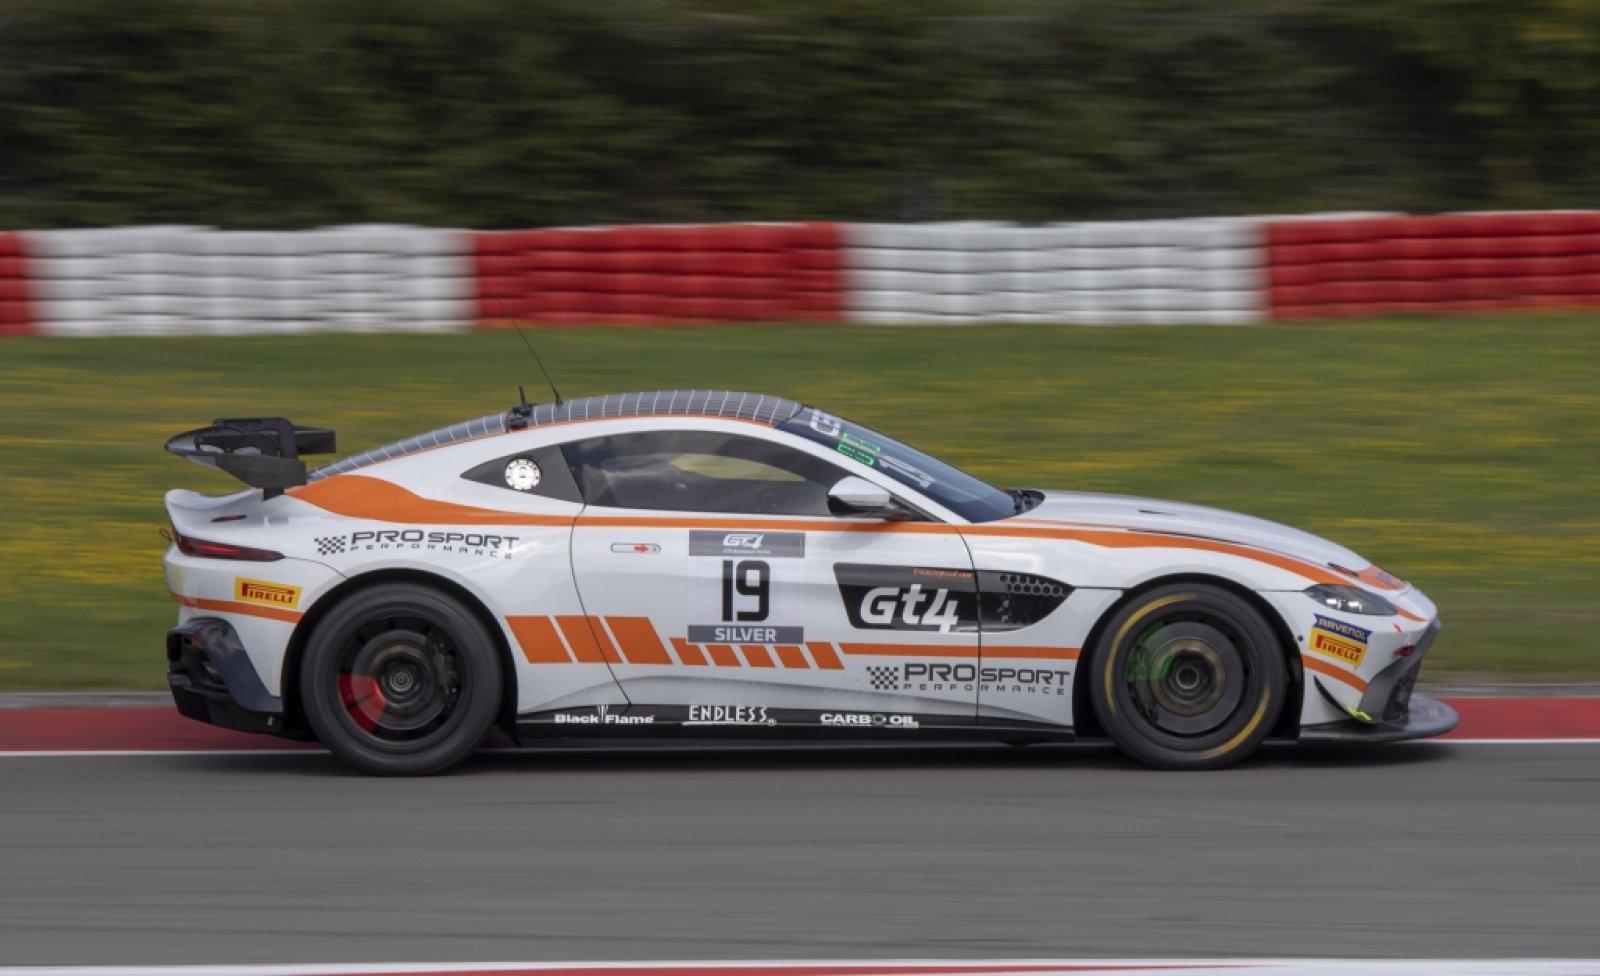 2x Aston Martin Vantage Amr Gt4 Gt4 European Series